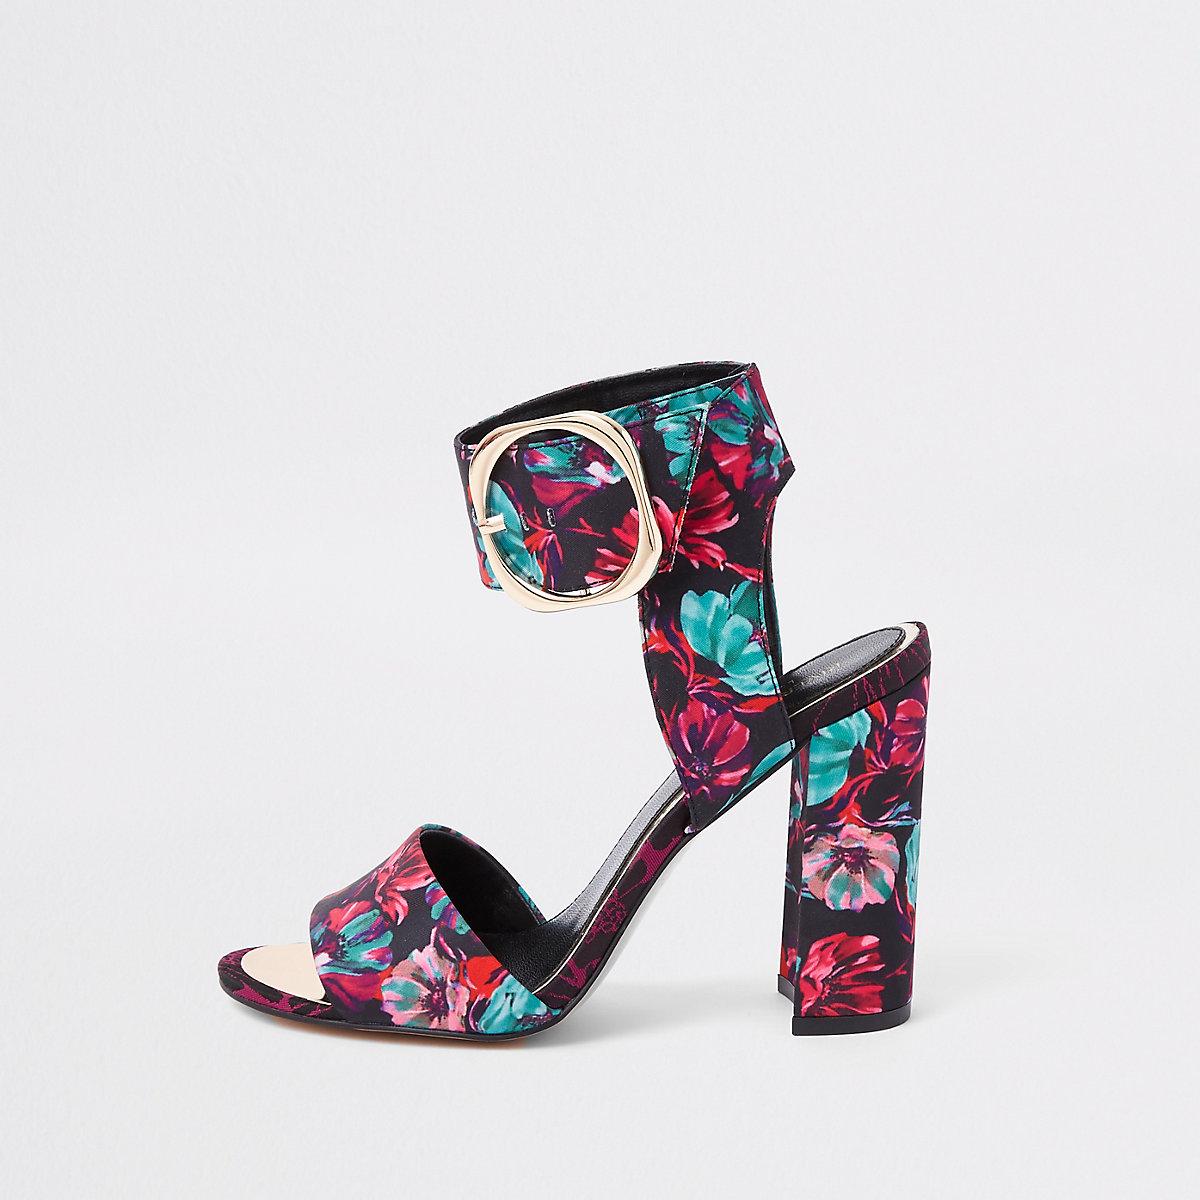 Black floral print block heel sandals